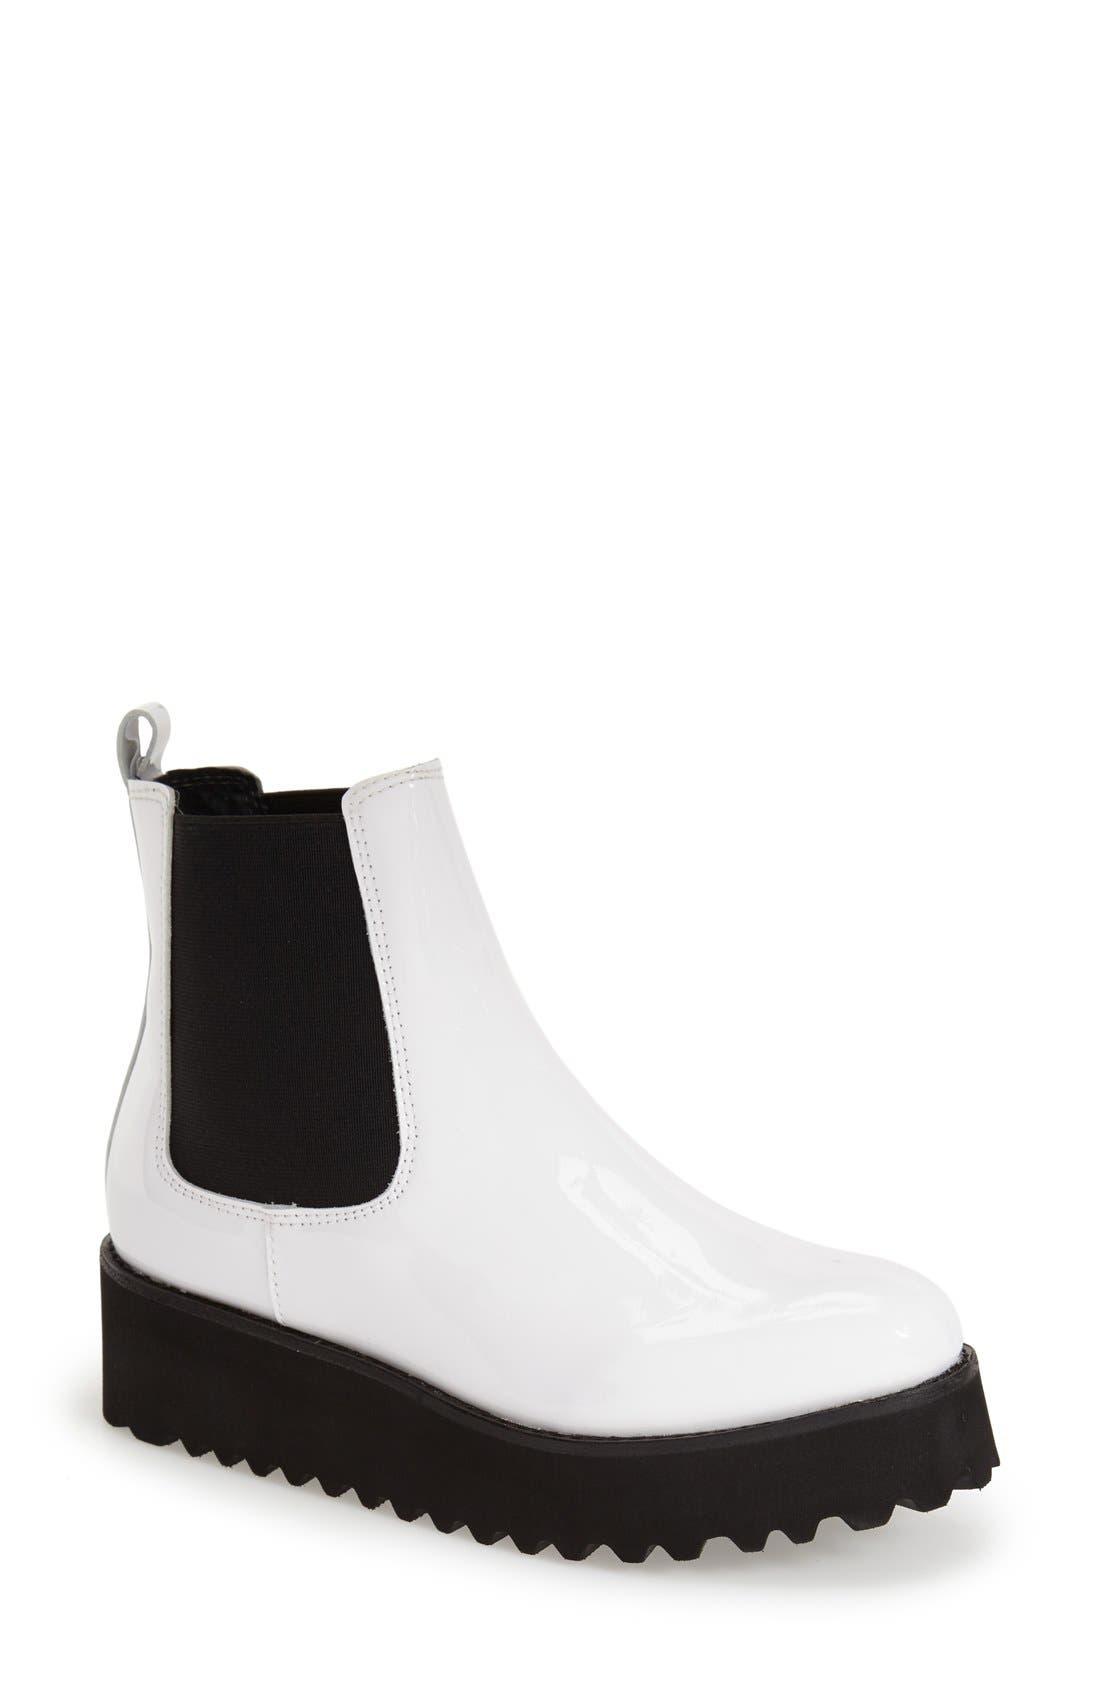 Main Image - Jeffrey Campbell 'Zayden' Platform Chelsea Boot (Women)